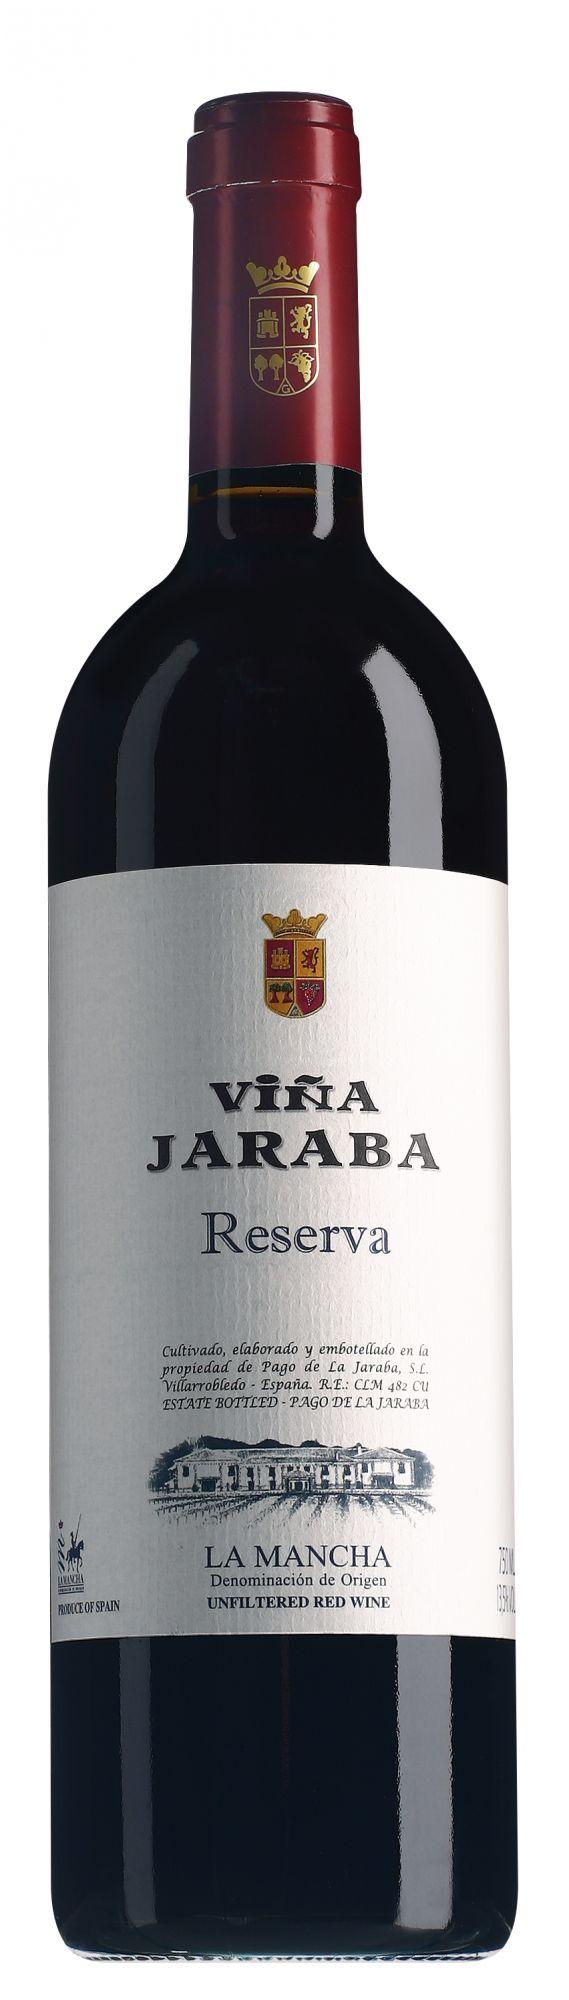 Viña Jaraba La Mancha Reserva